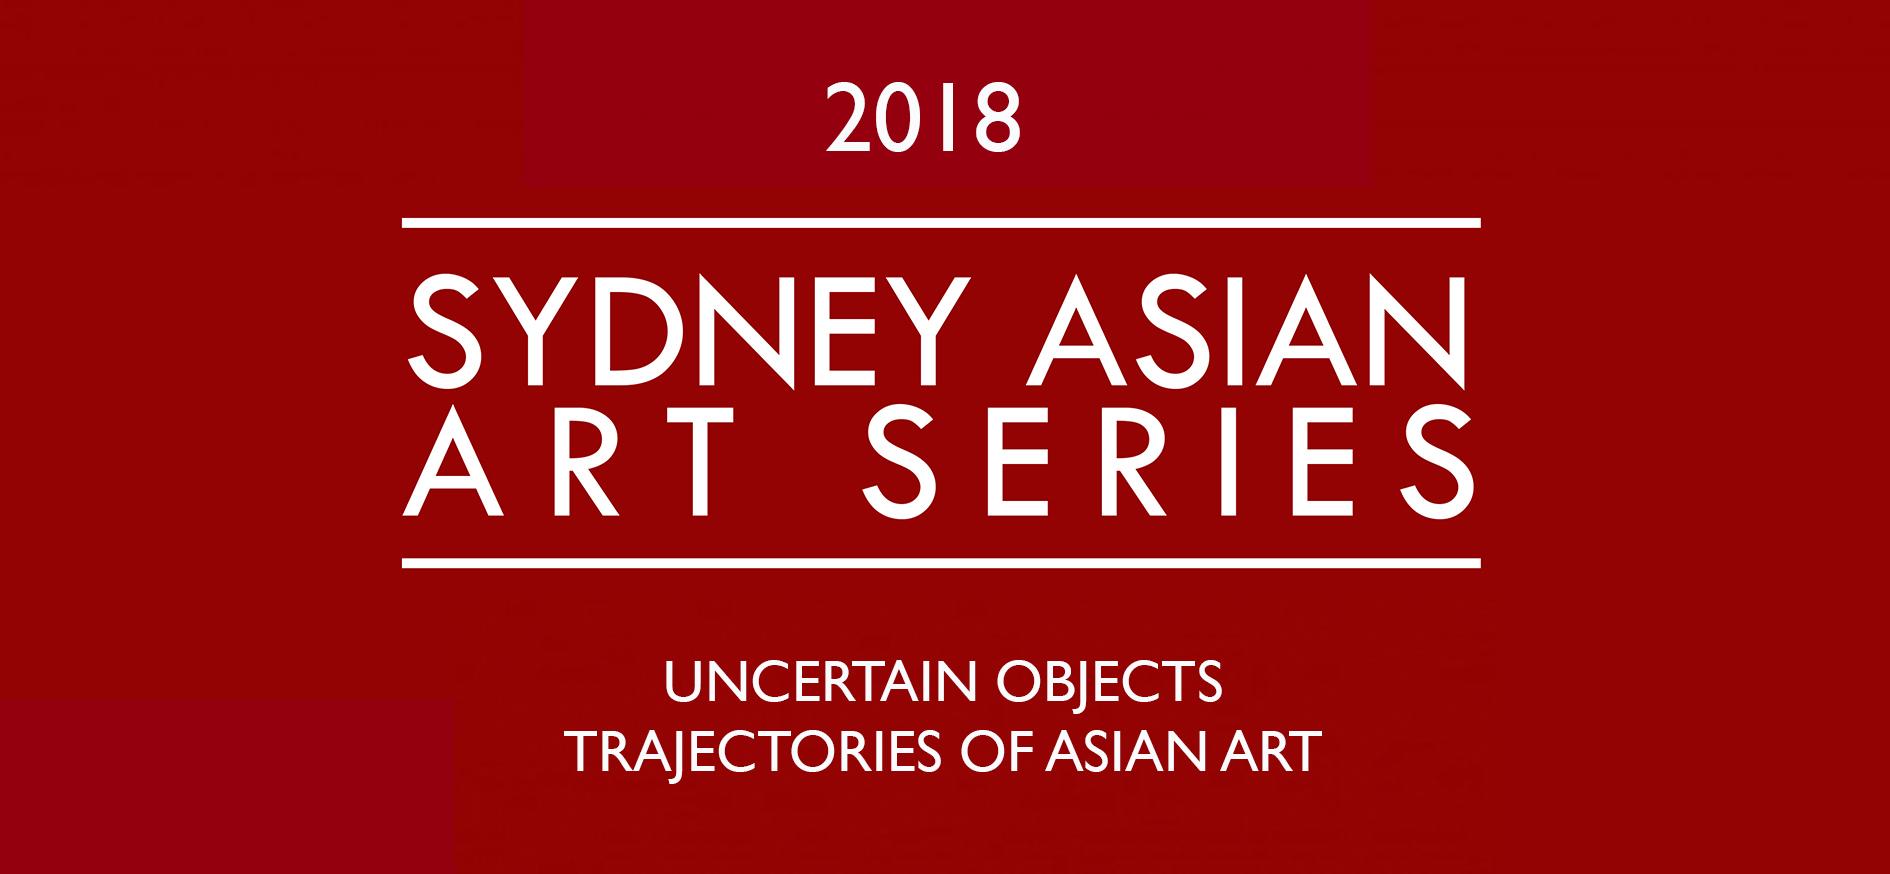 Uncertain Objects: Trajectories of Asian Art